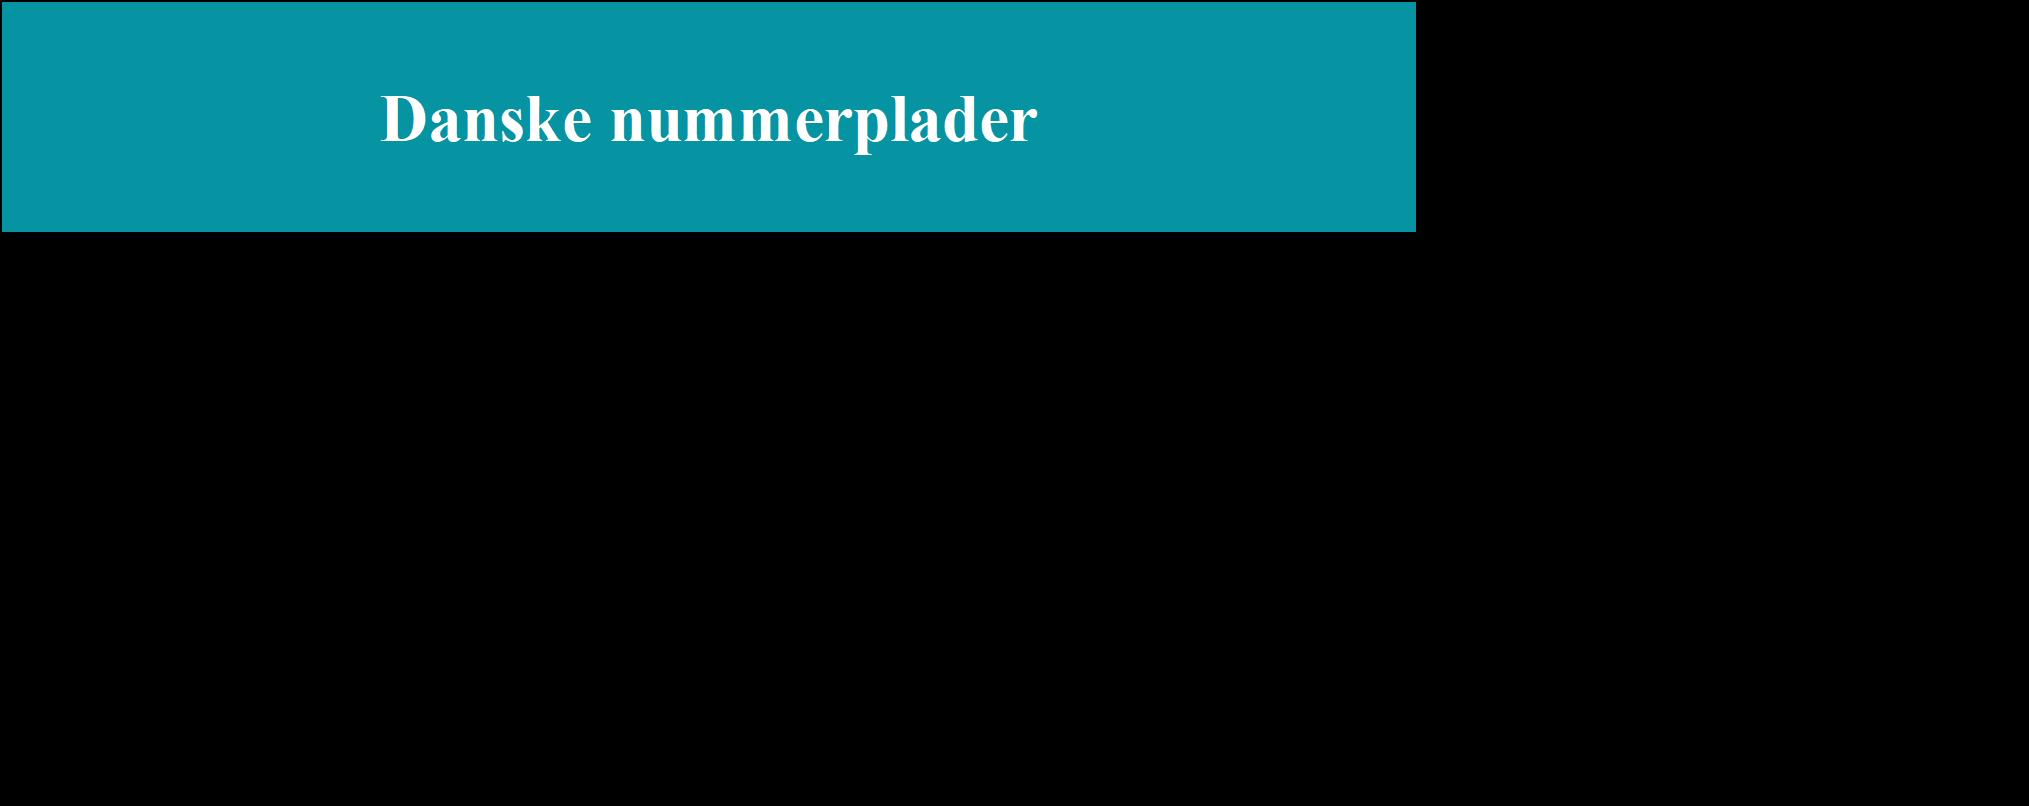 nummerplade.png